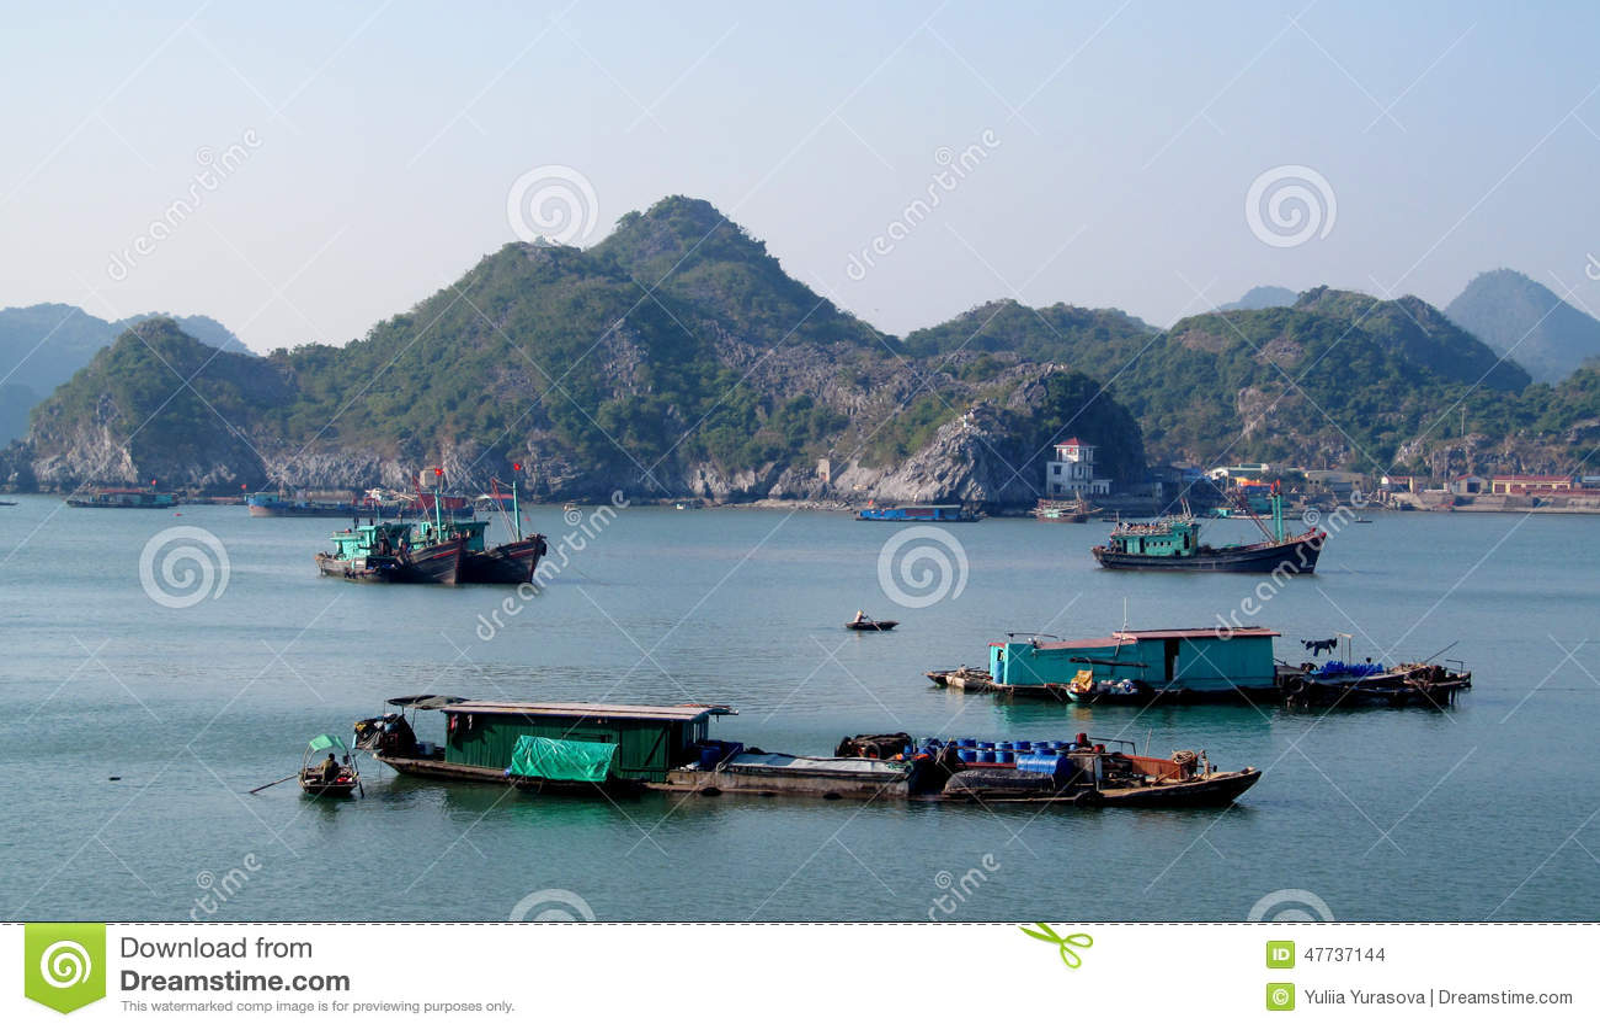 House Boats In Ha Long Bay Near Cat Ba Island, Vietnam Editorial Stock Image - Image: 47737144